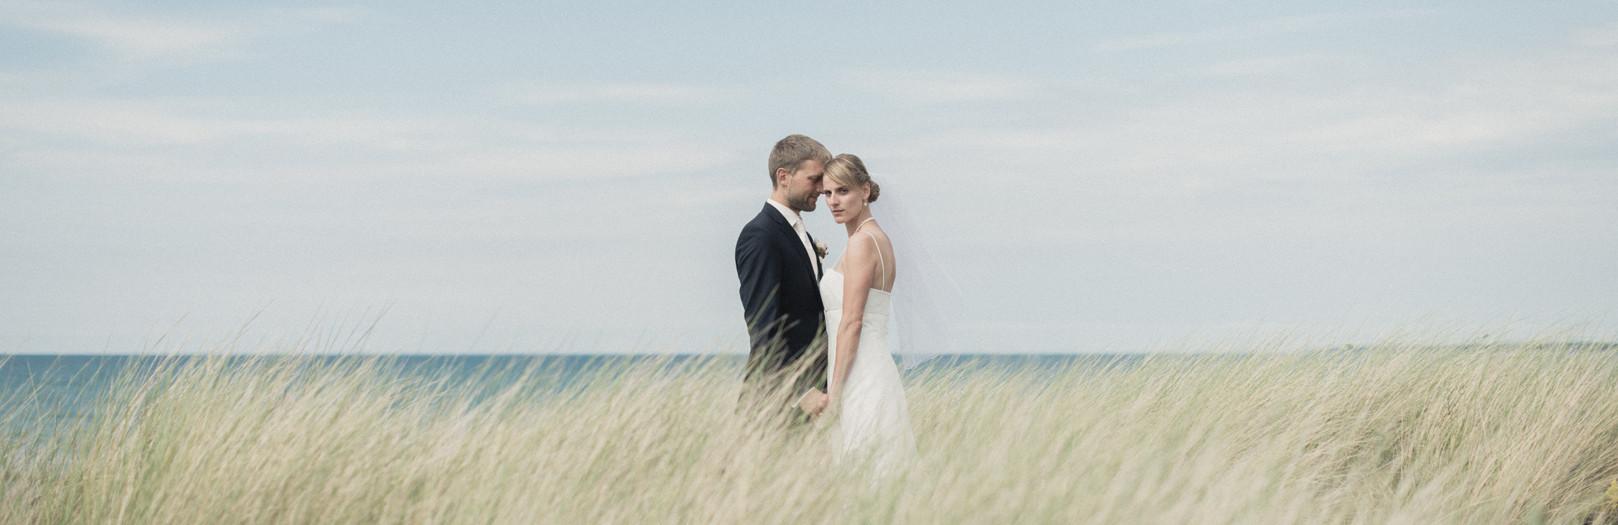 Hochzeit Ahrenshoop - Claudia & Oliver